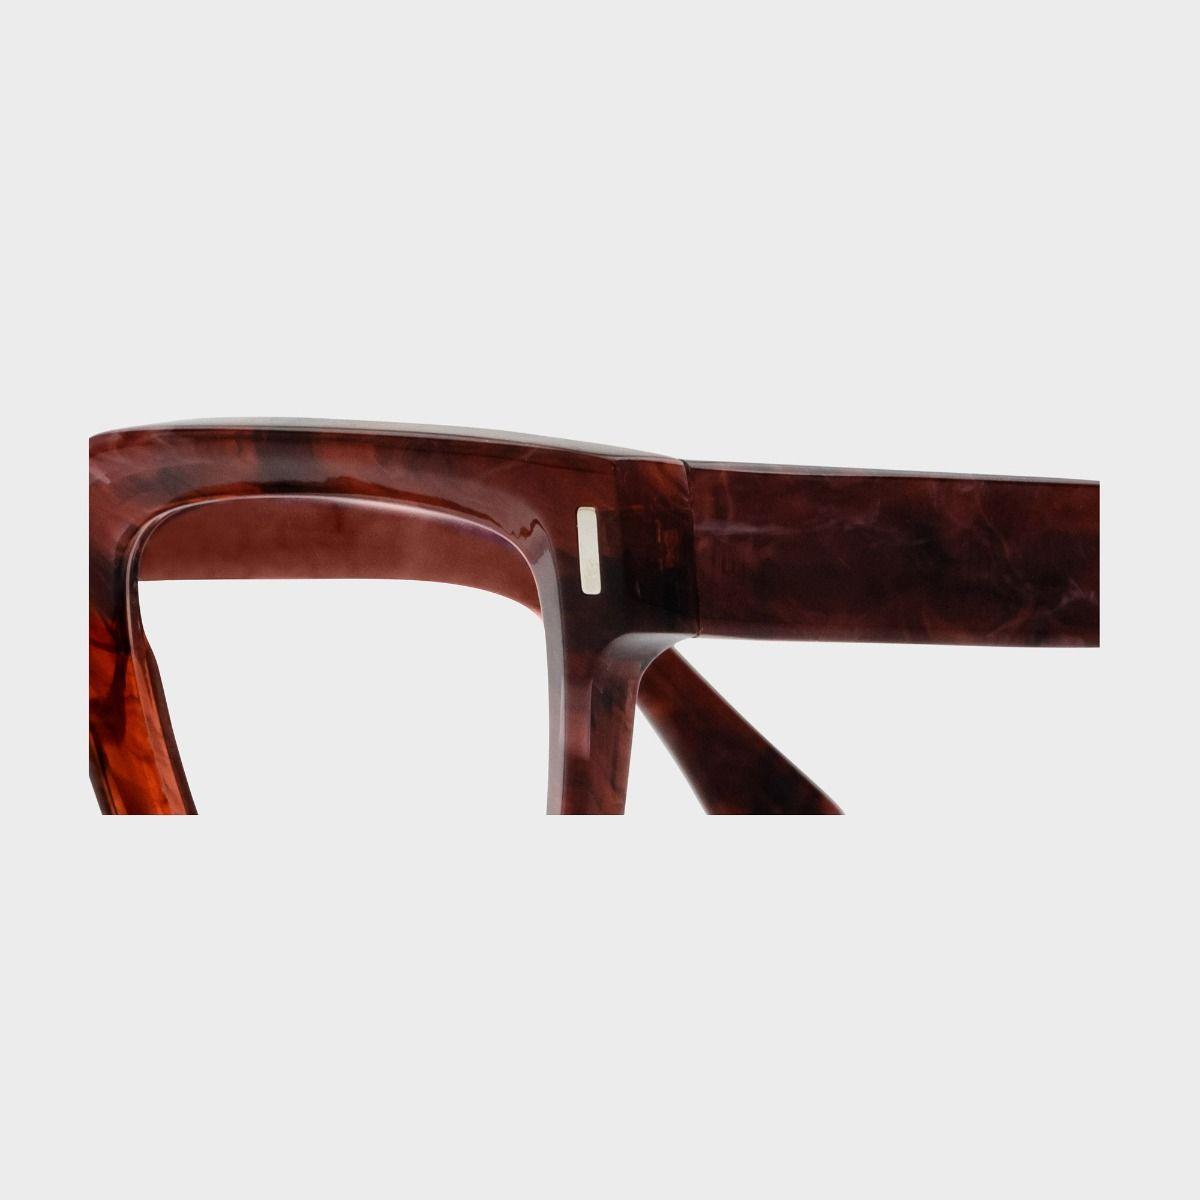 1386 Optical Square Glasses-Burgundy Marble